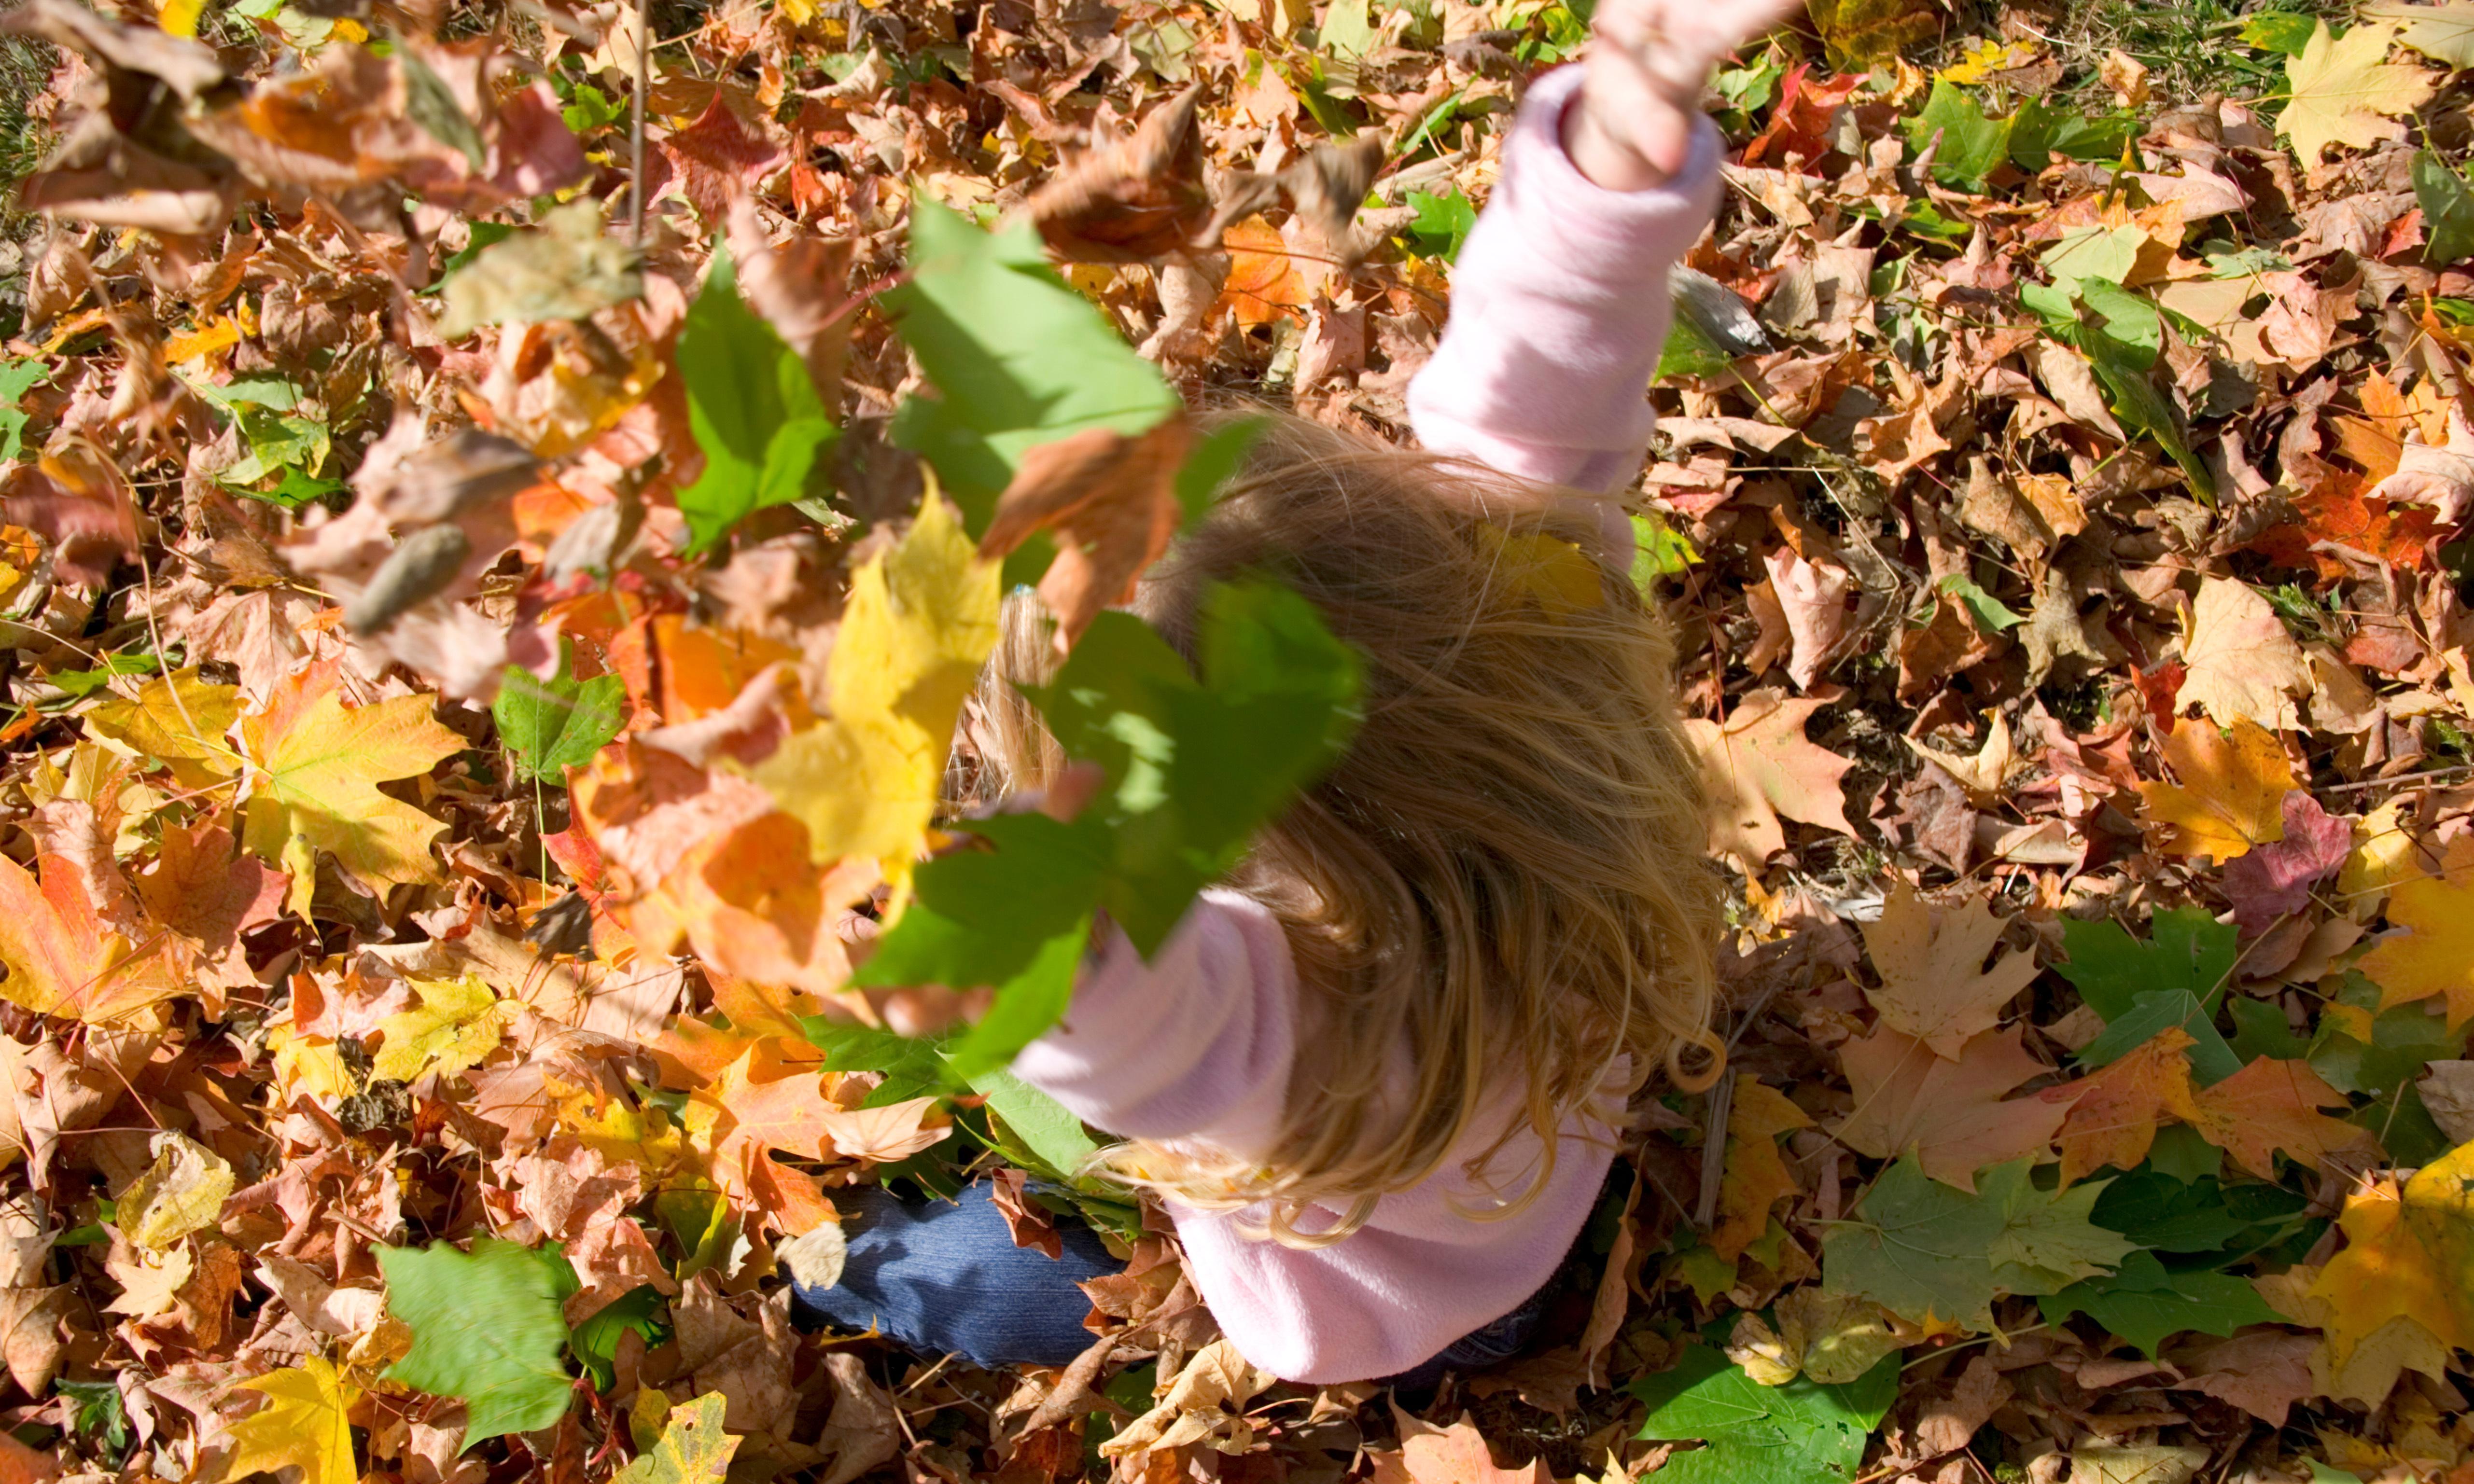 Chekhov and Georgia O'Keeffe loved autumn leaves, and so do I